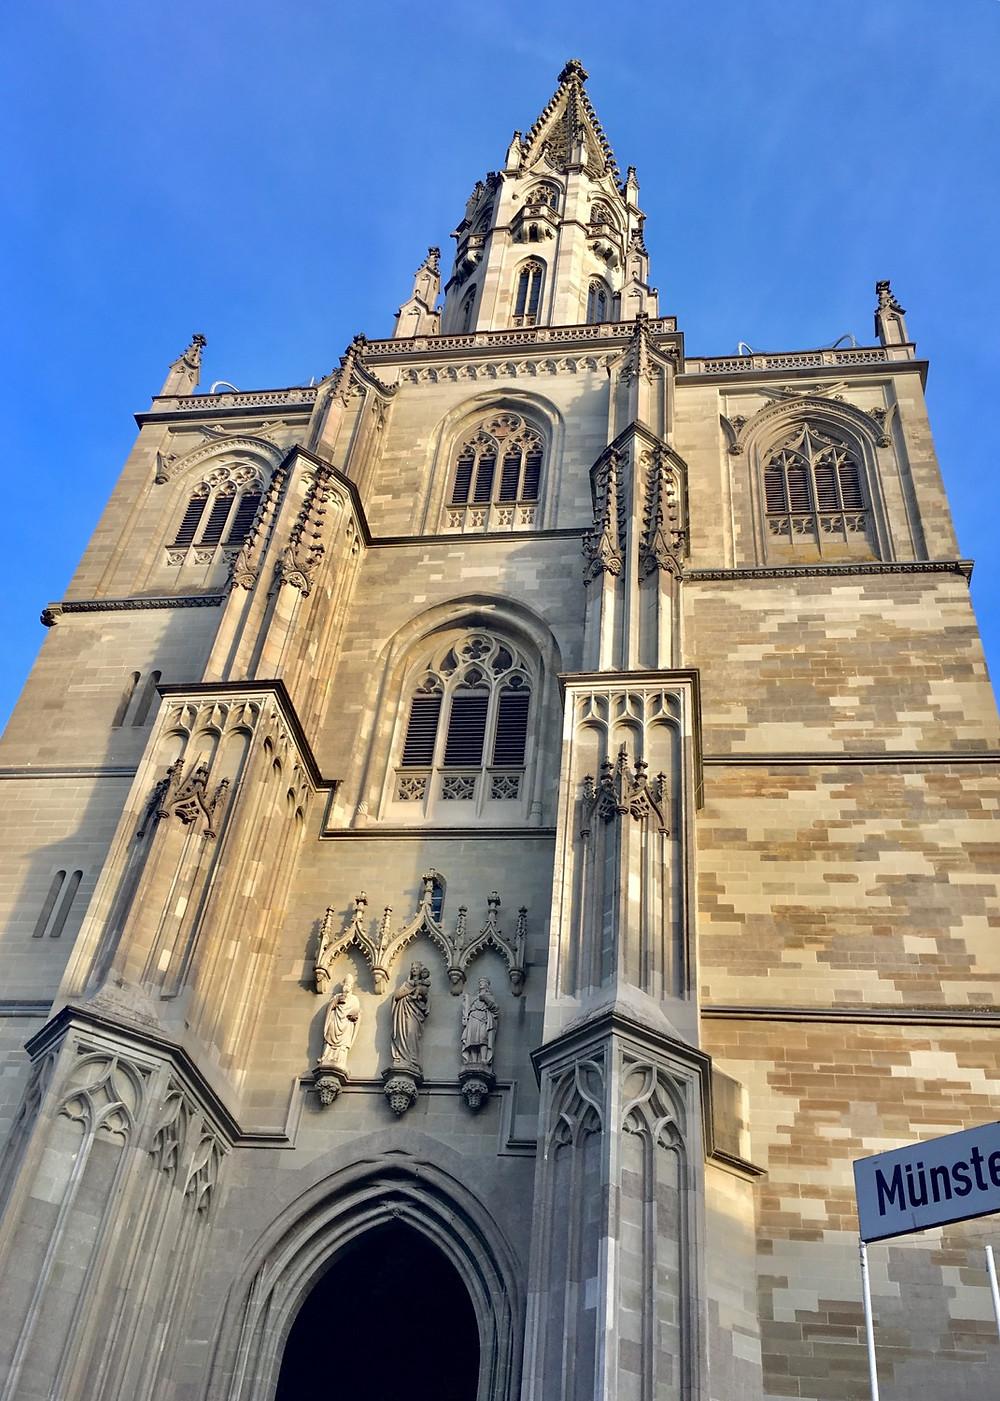 Konstanz Cathedral